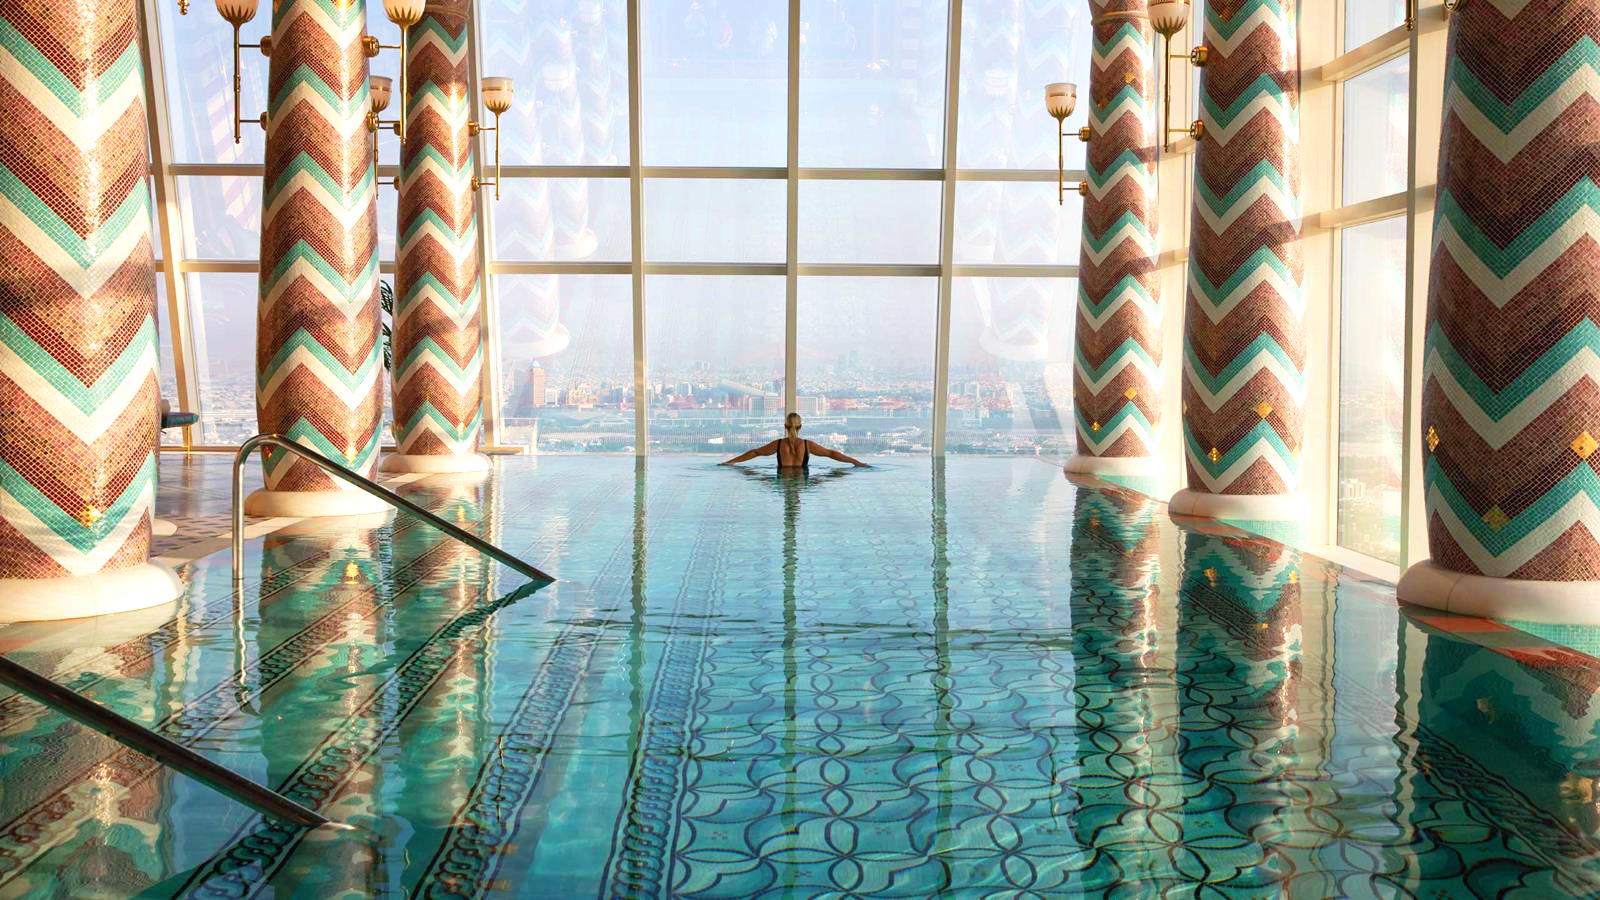 burj-al-arab-talise-spa-female-pool4-hero copy.jpg